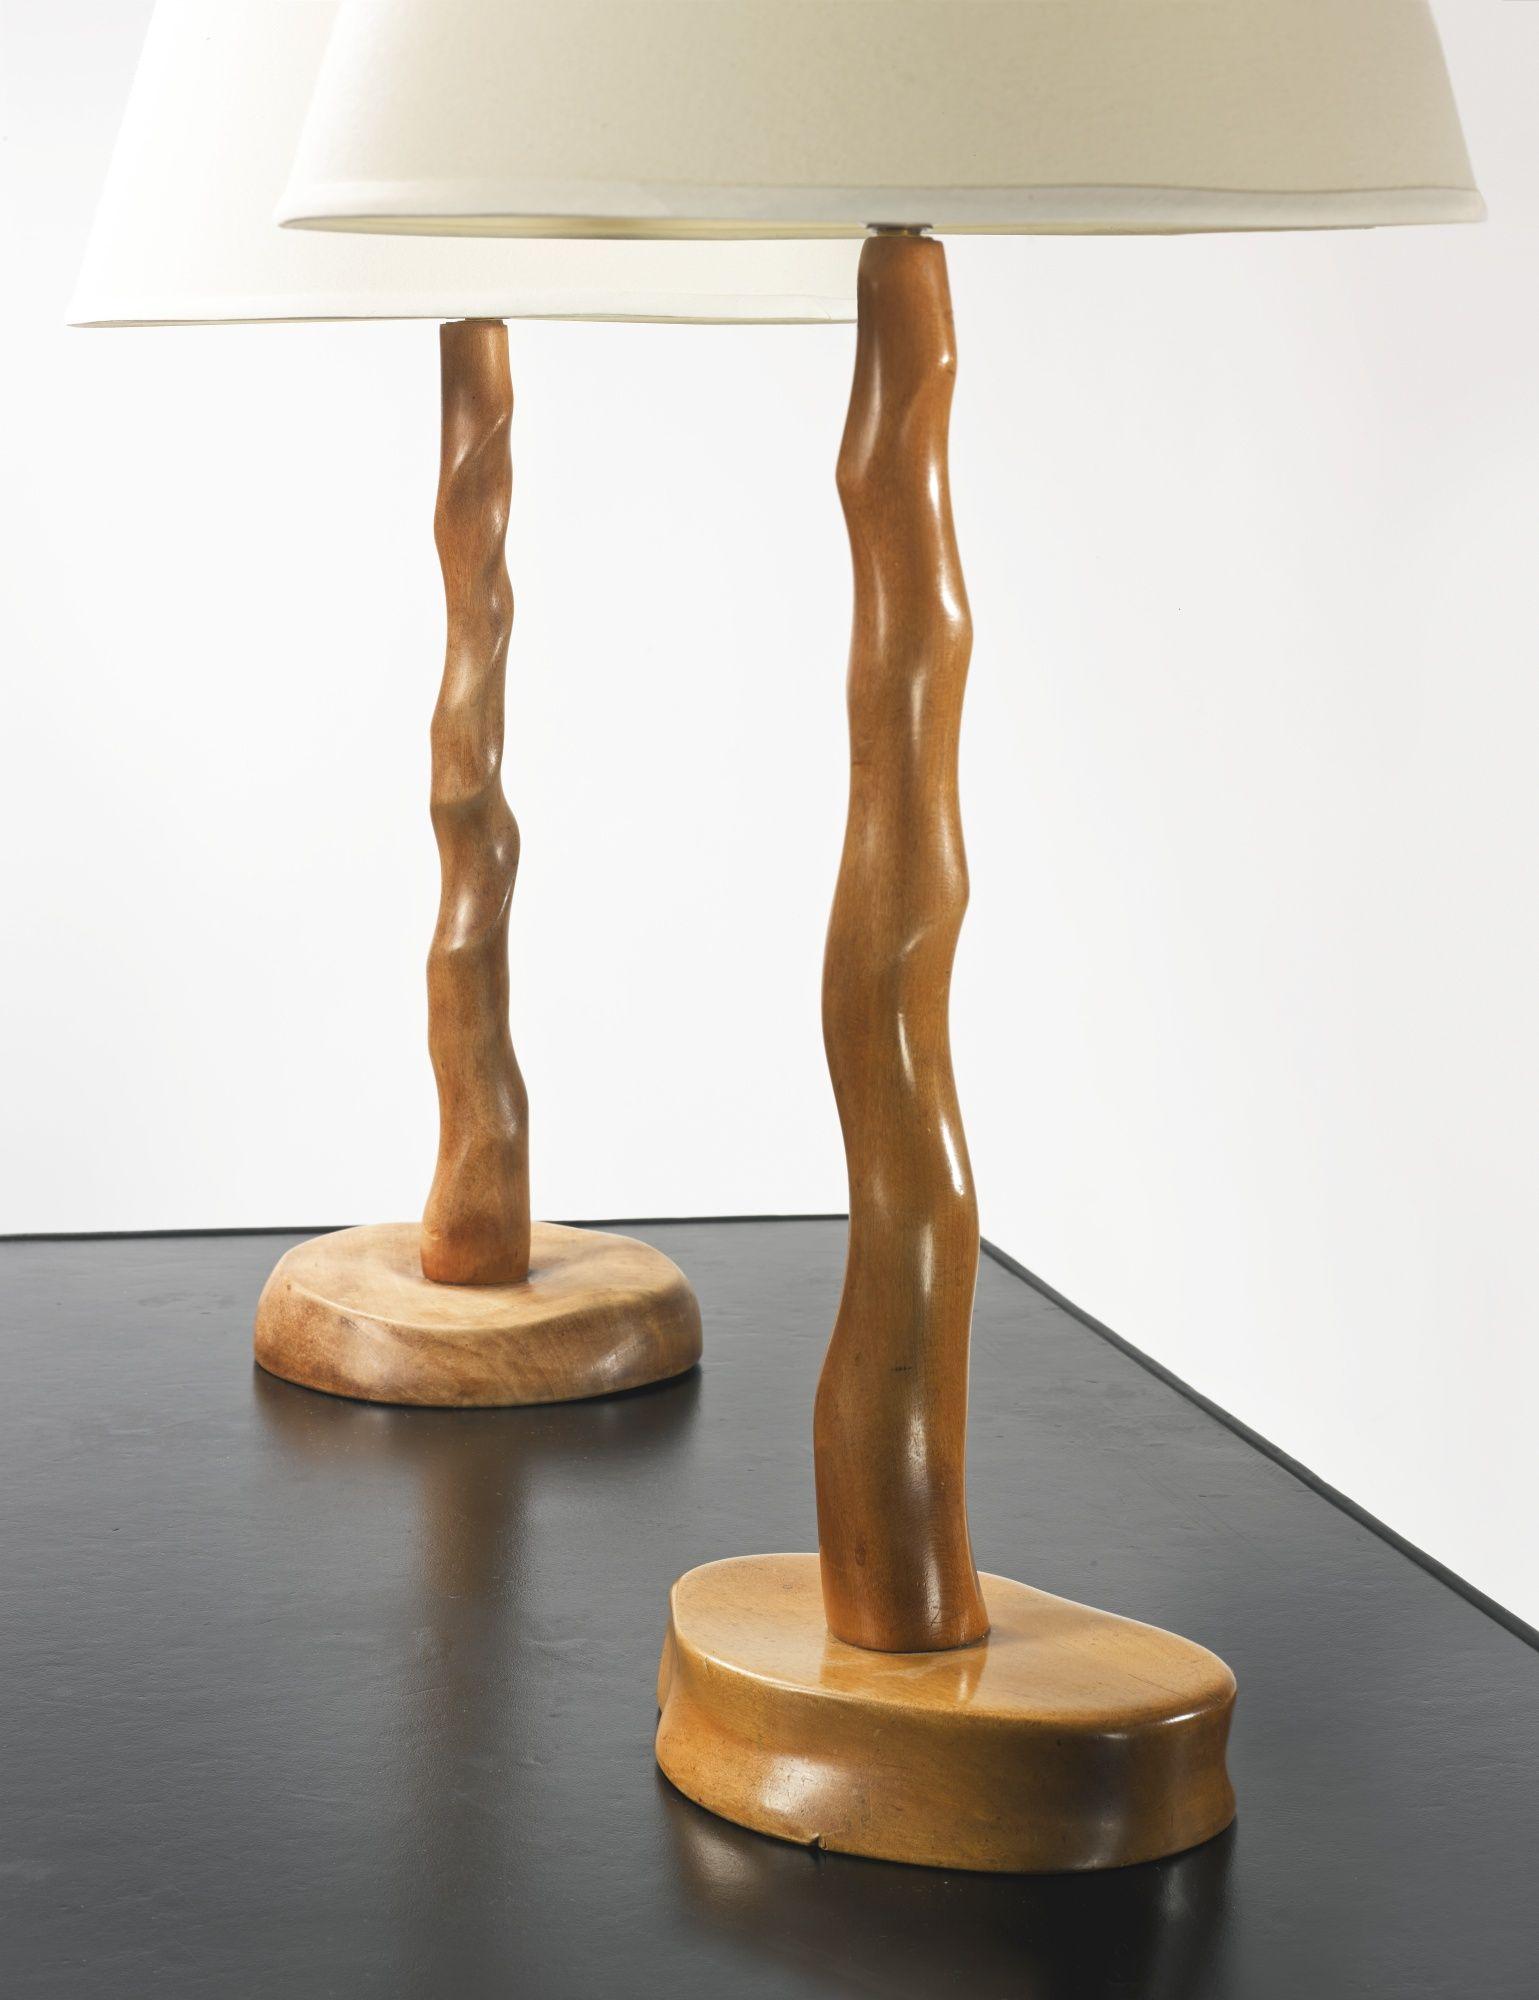 Alexandre noll mahogany table lamps c1950 surface lighted alexandre noll mahogany table lamps c1950 geotapseo Choice Image